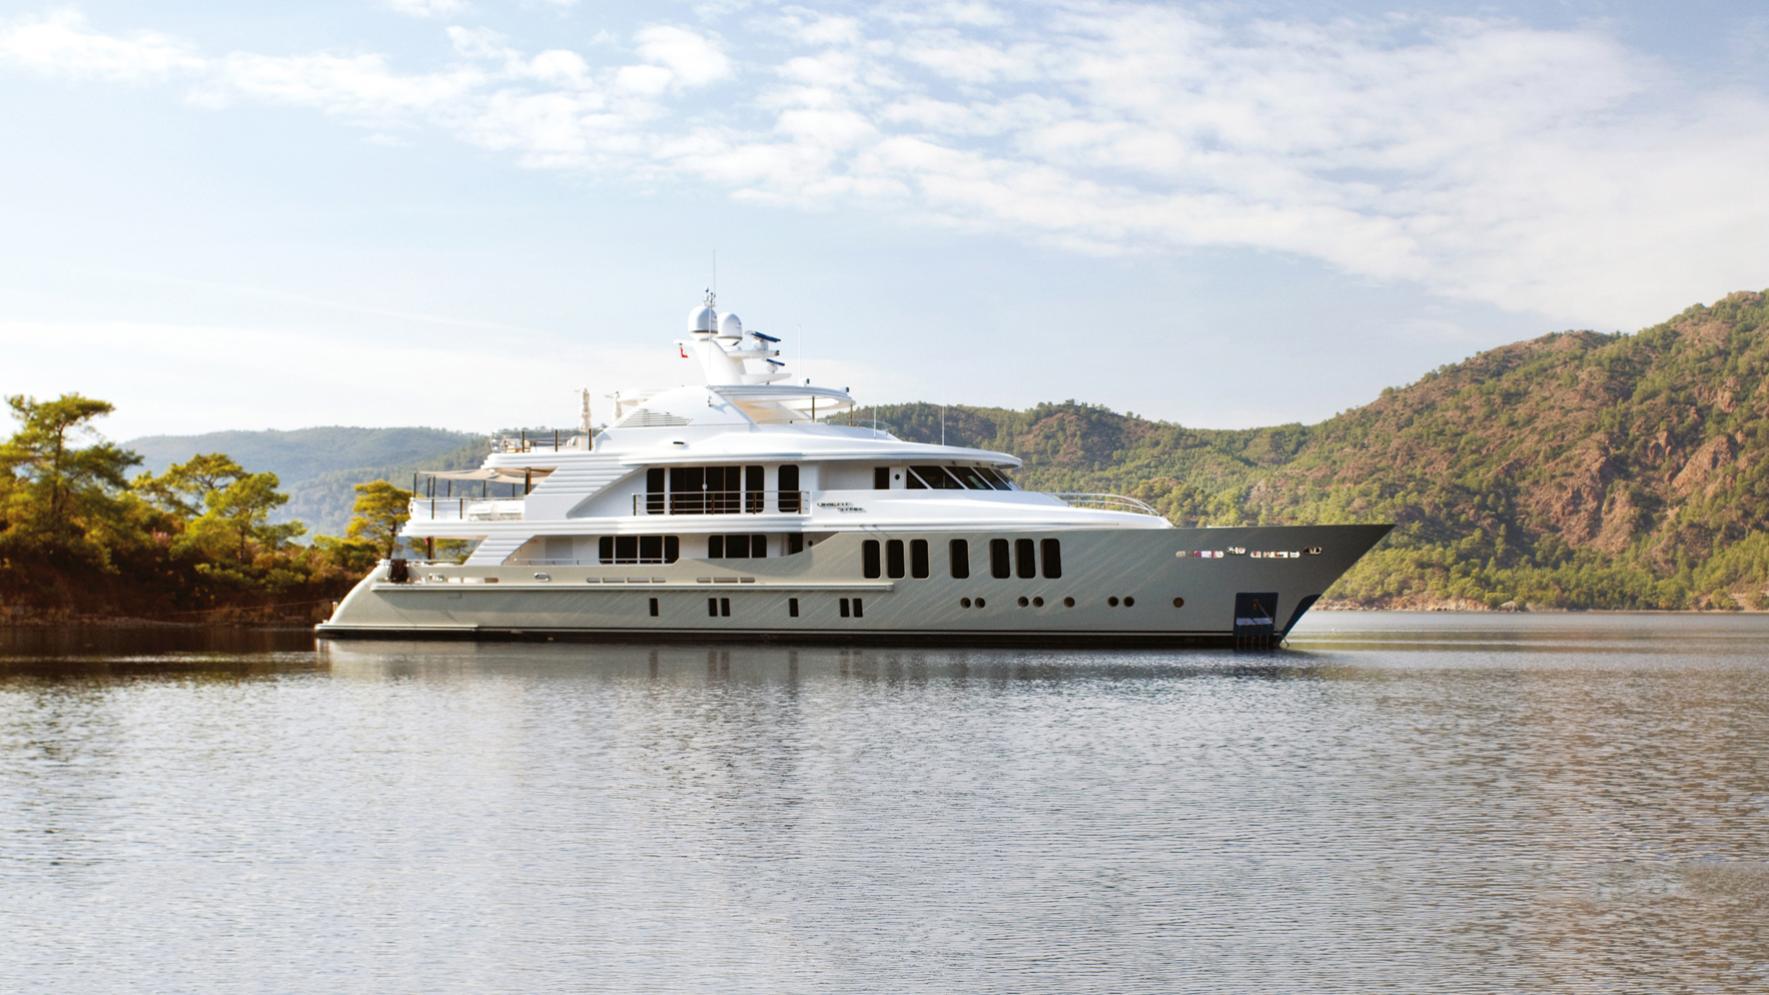 Orient-Star-motor-yacht-cmb-2013-46m-profile